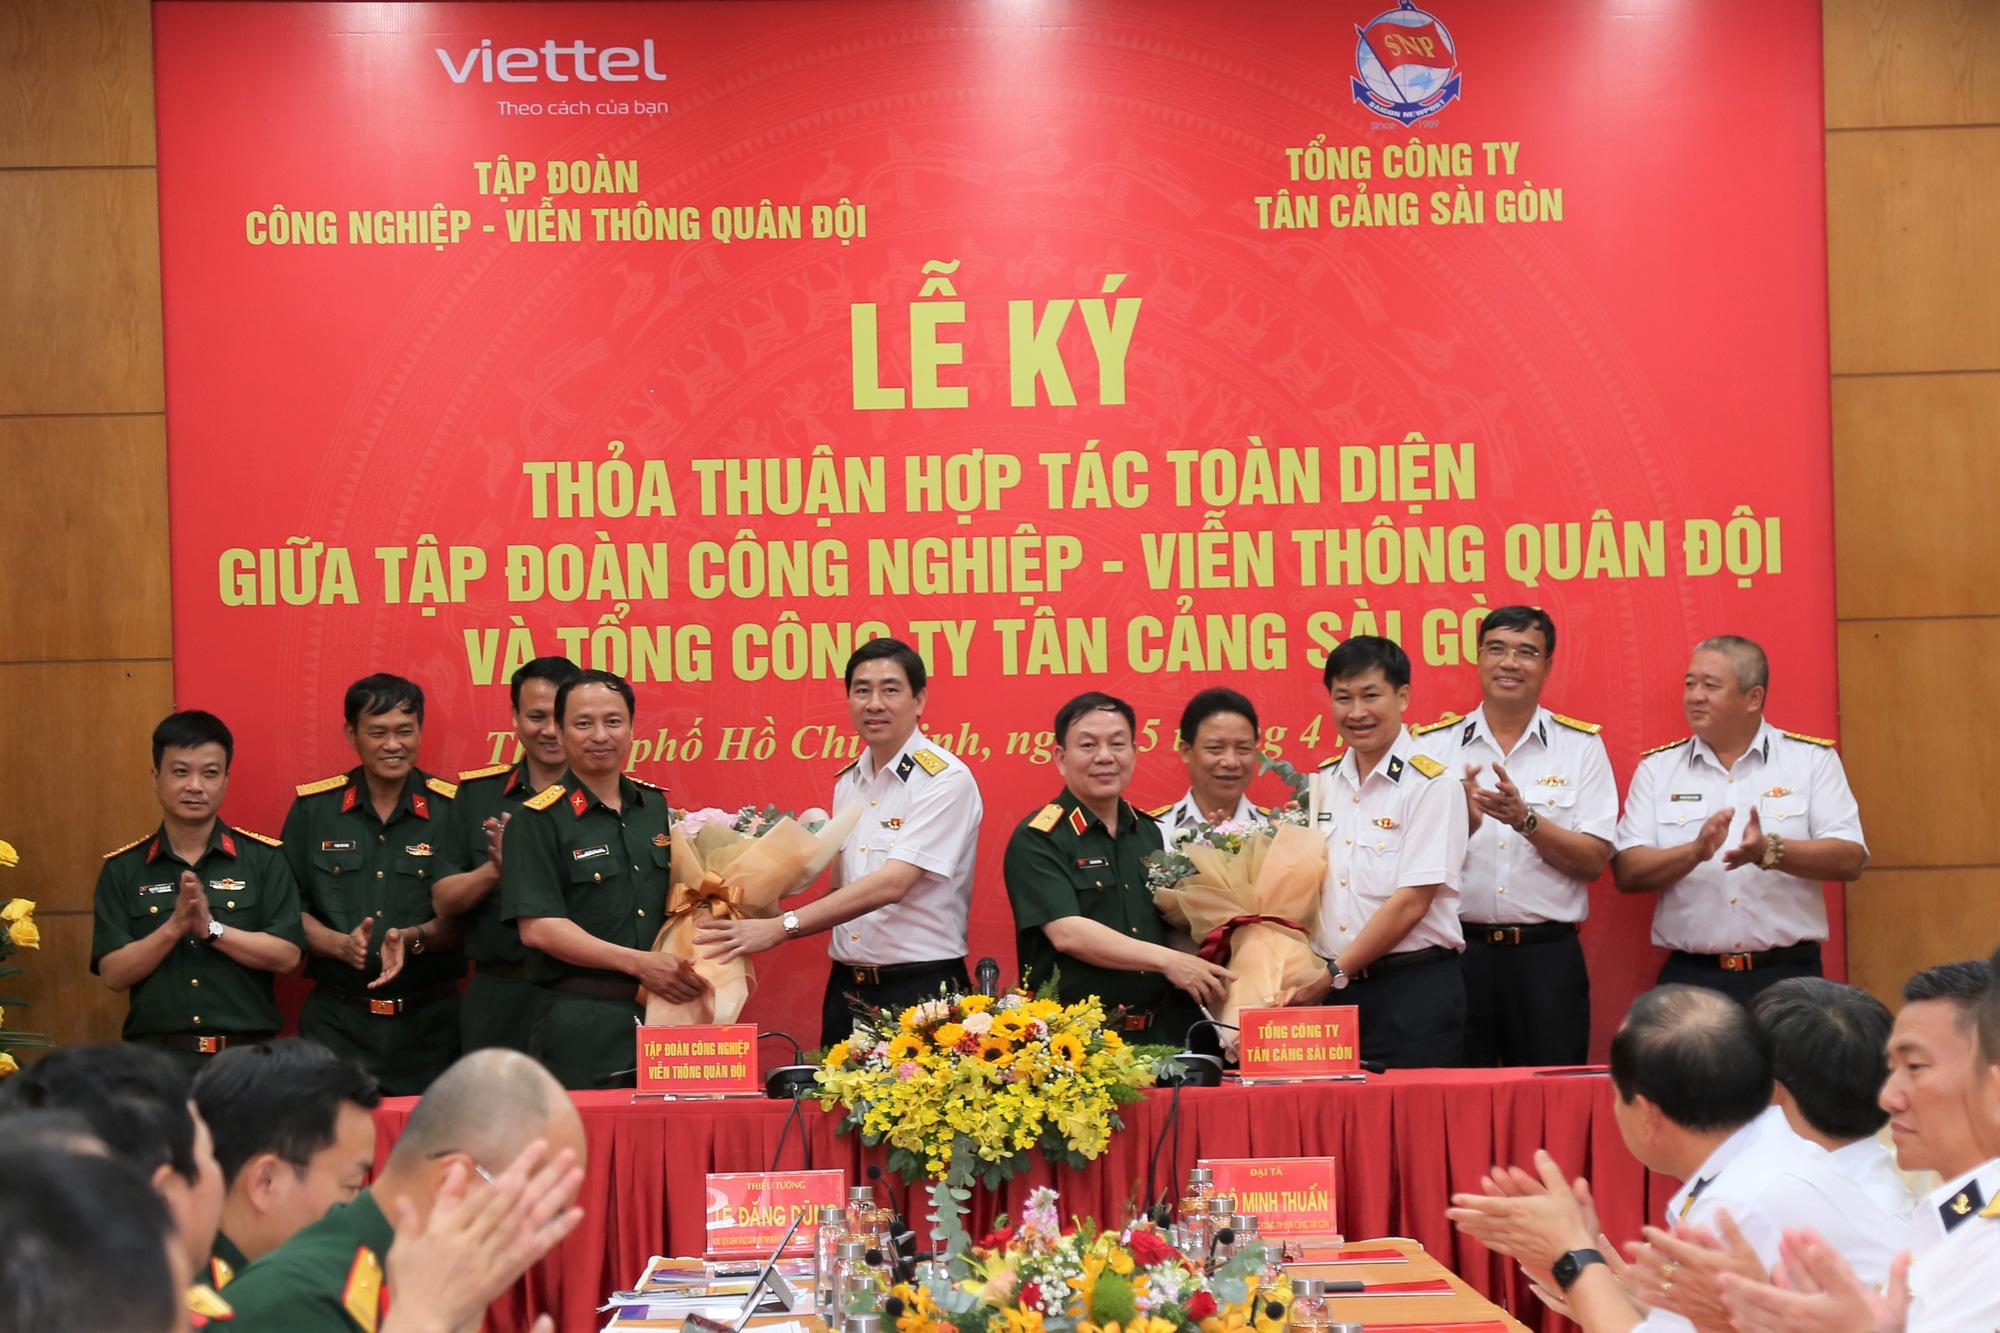 Military-run Viettel, Saigon Newport Corporation inks deal on multiple spheres, including e-commerce development